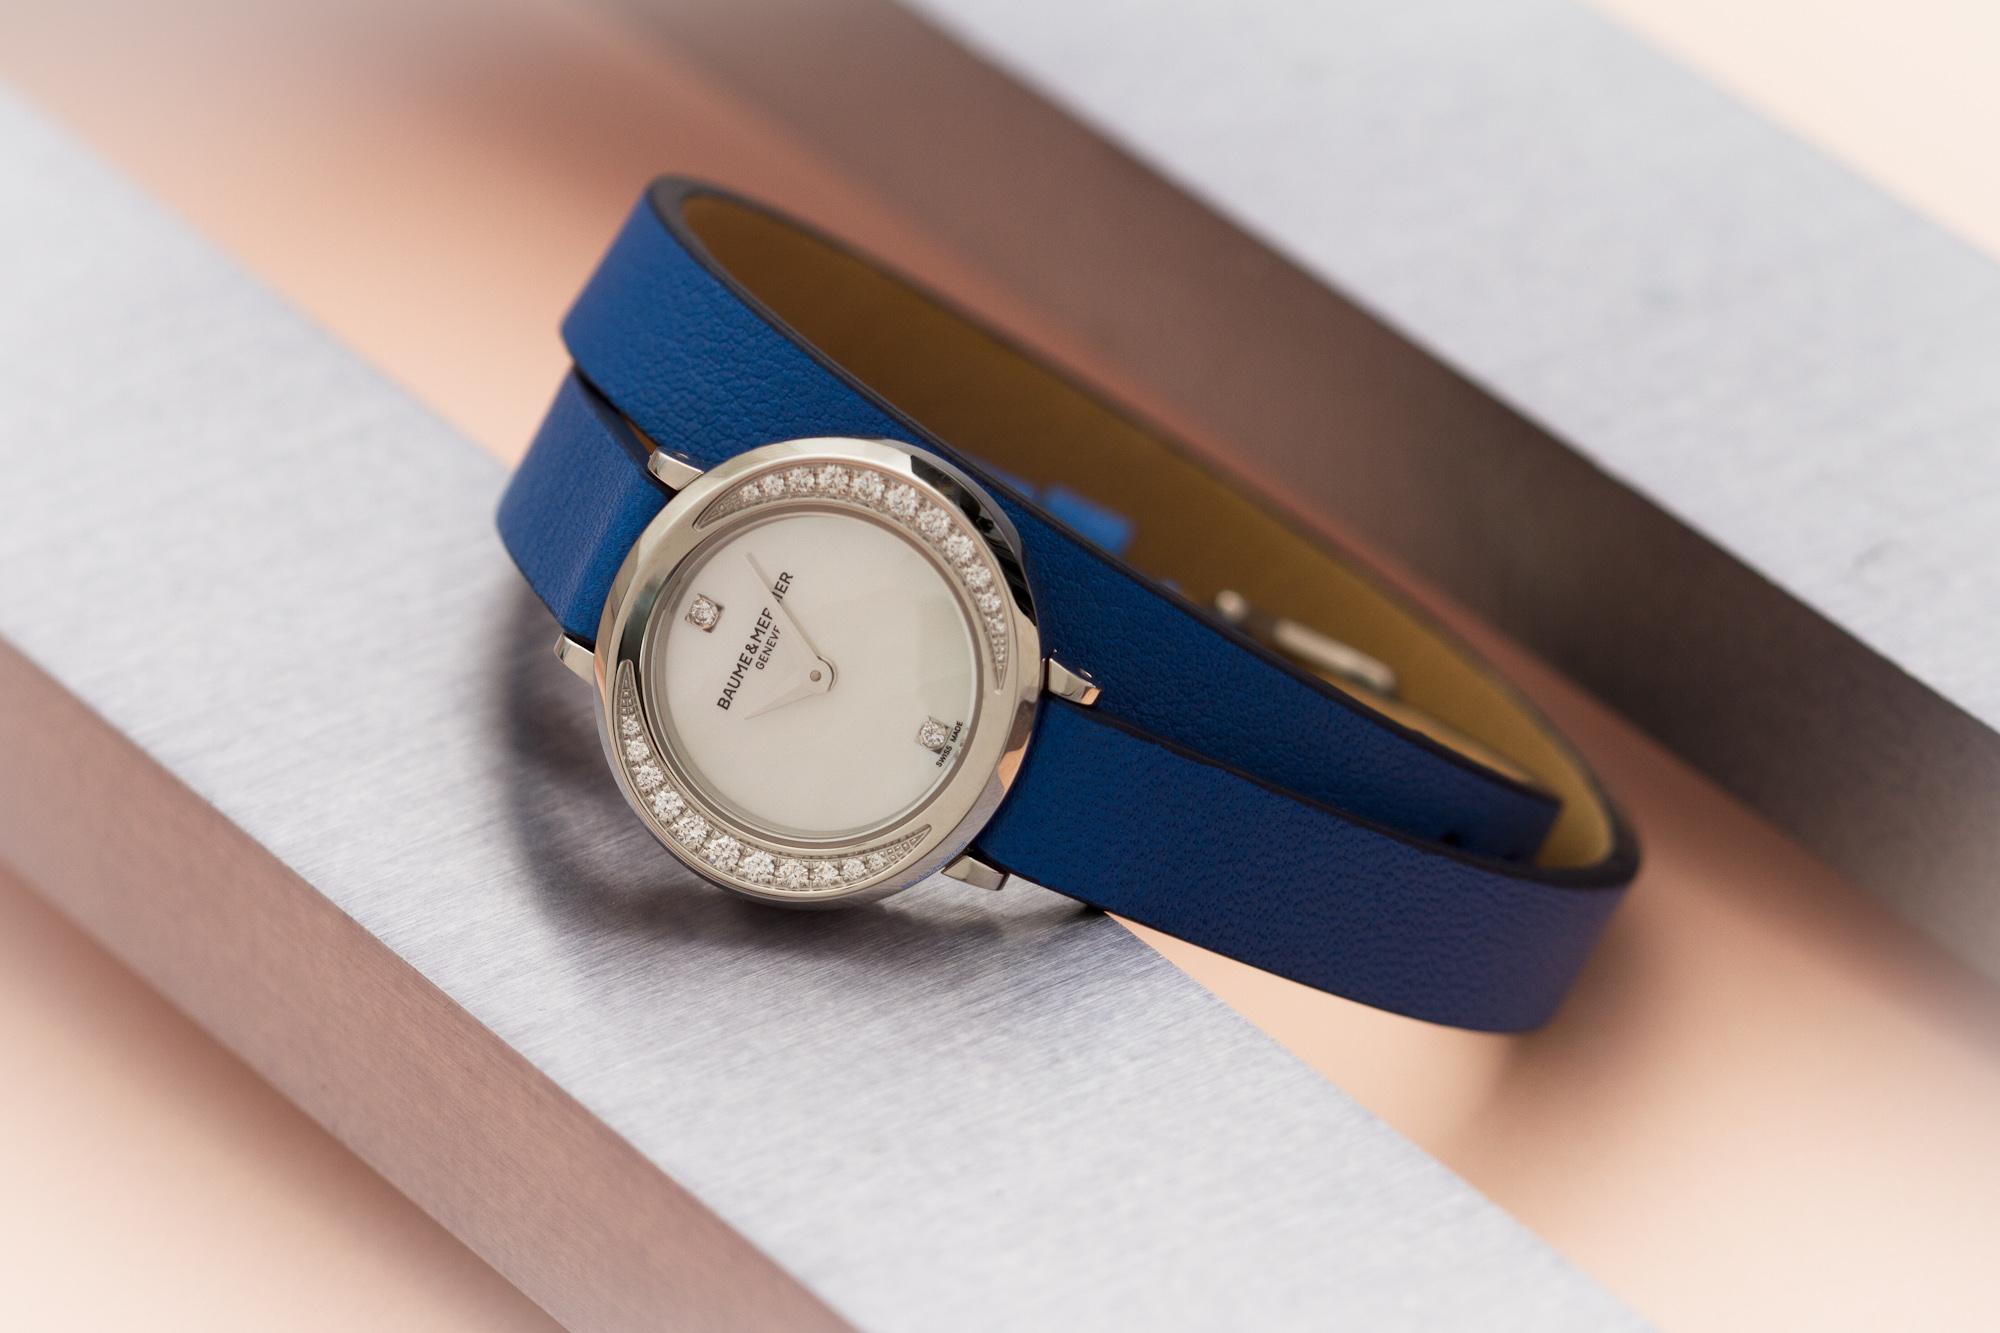 baume-et-mercier-petite-promesse-blue-strap-ace-jewelers-amsterdam-1